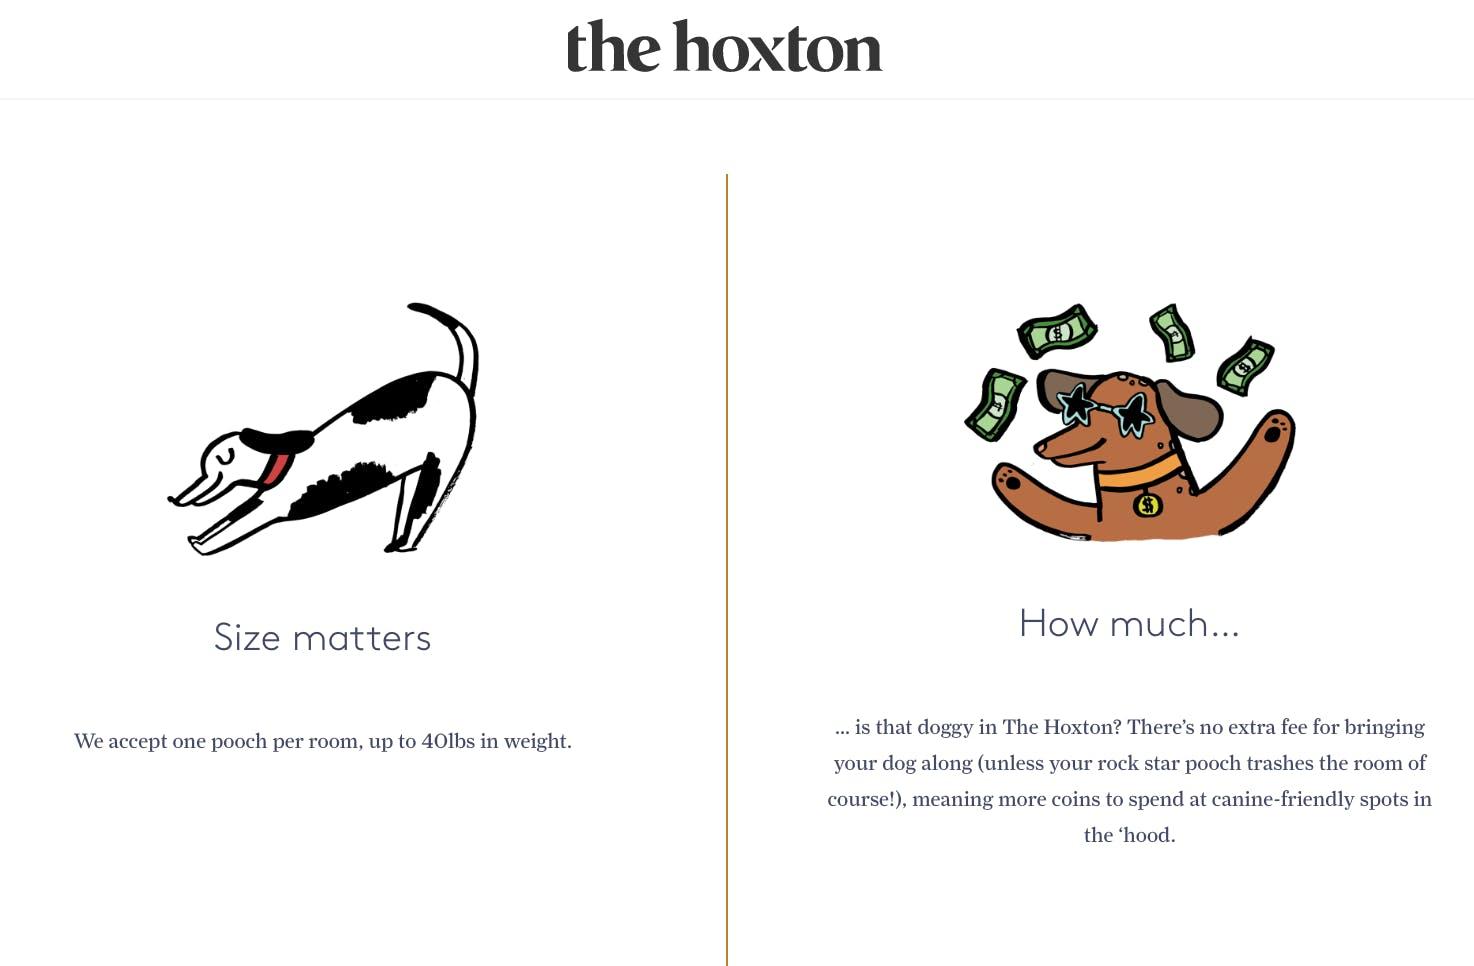 the hoxton dog